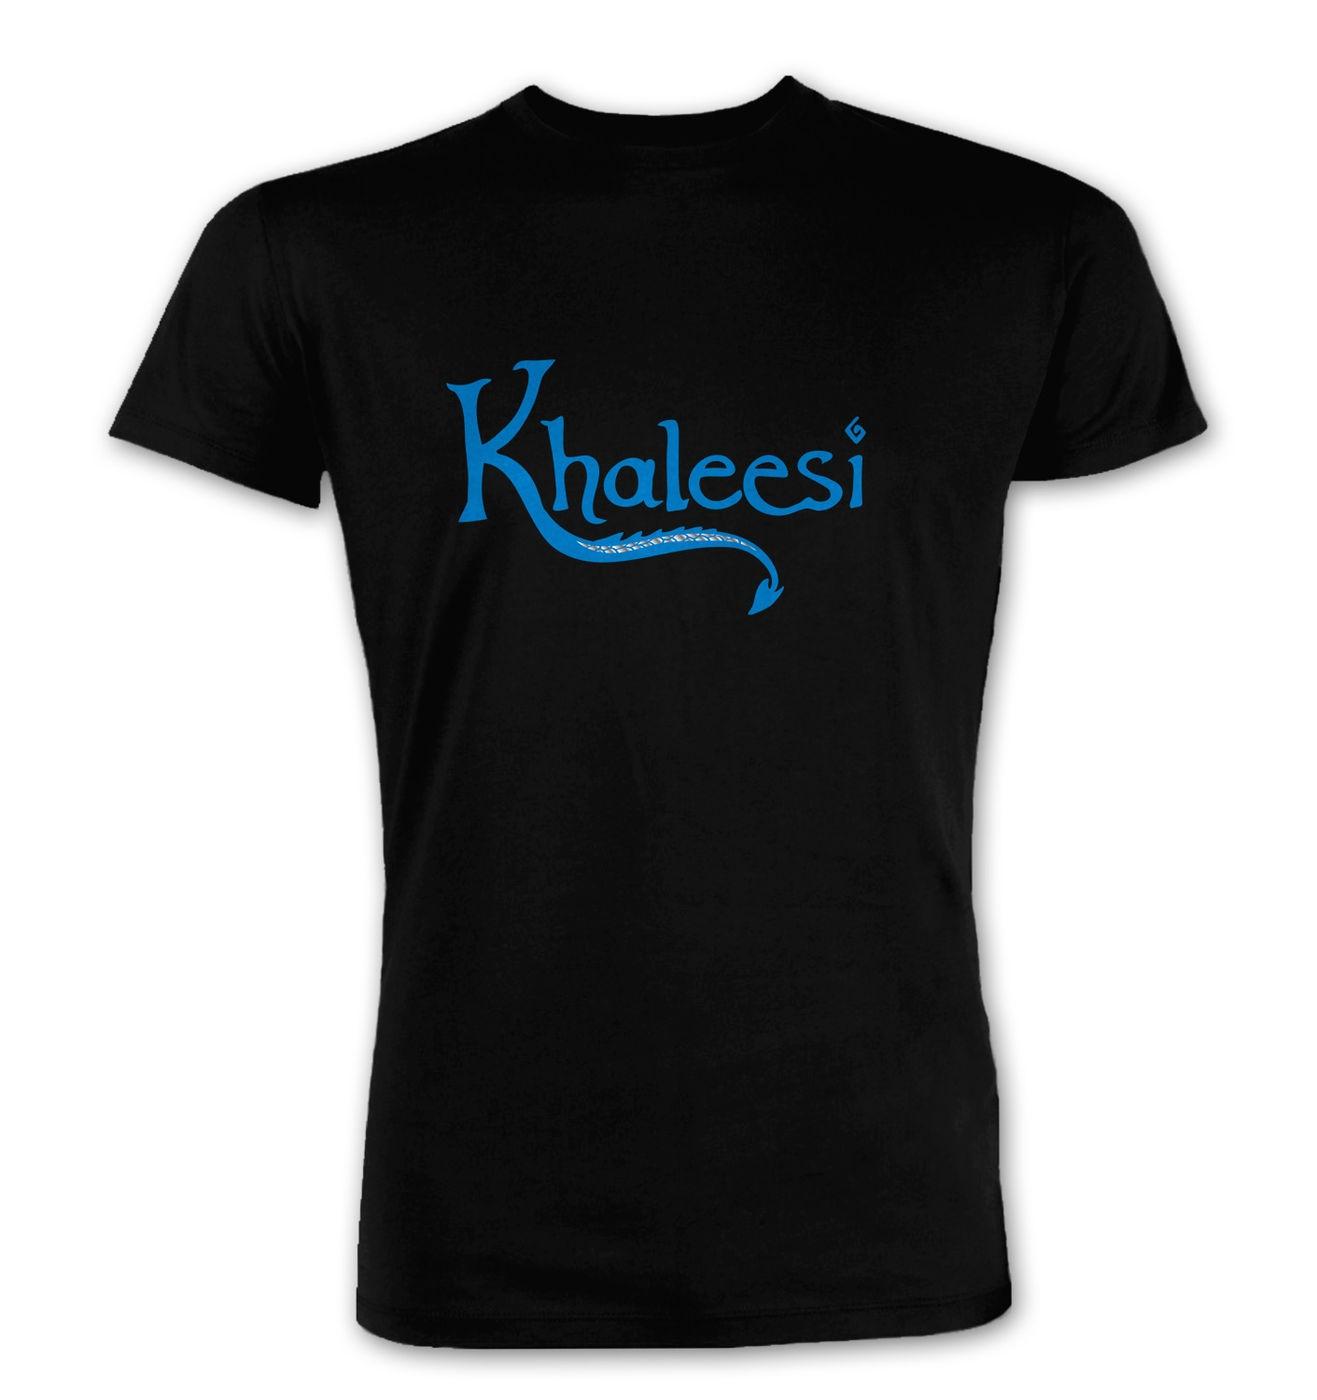 Khaleesi (blue) premium t-shirt by Something Geeky